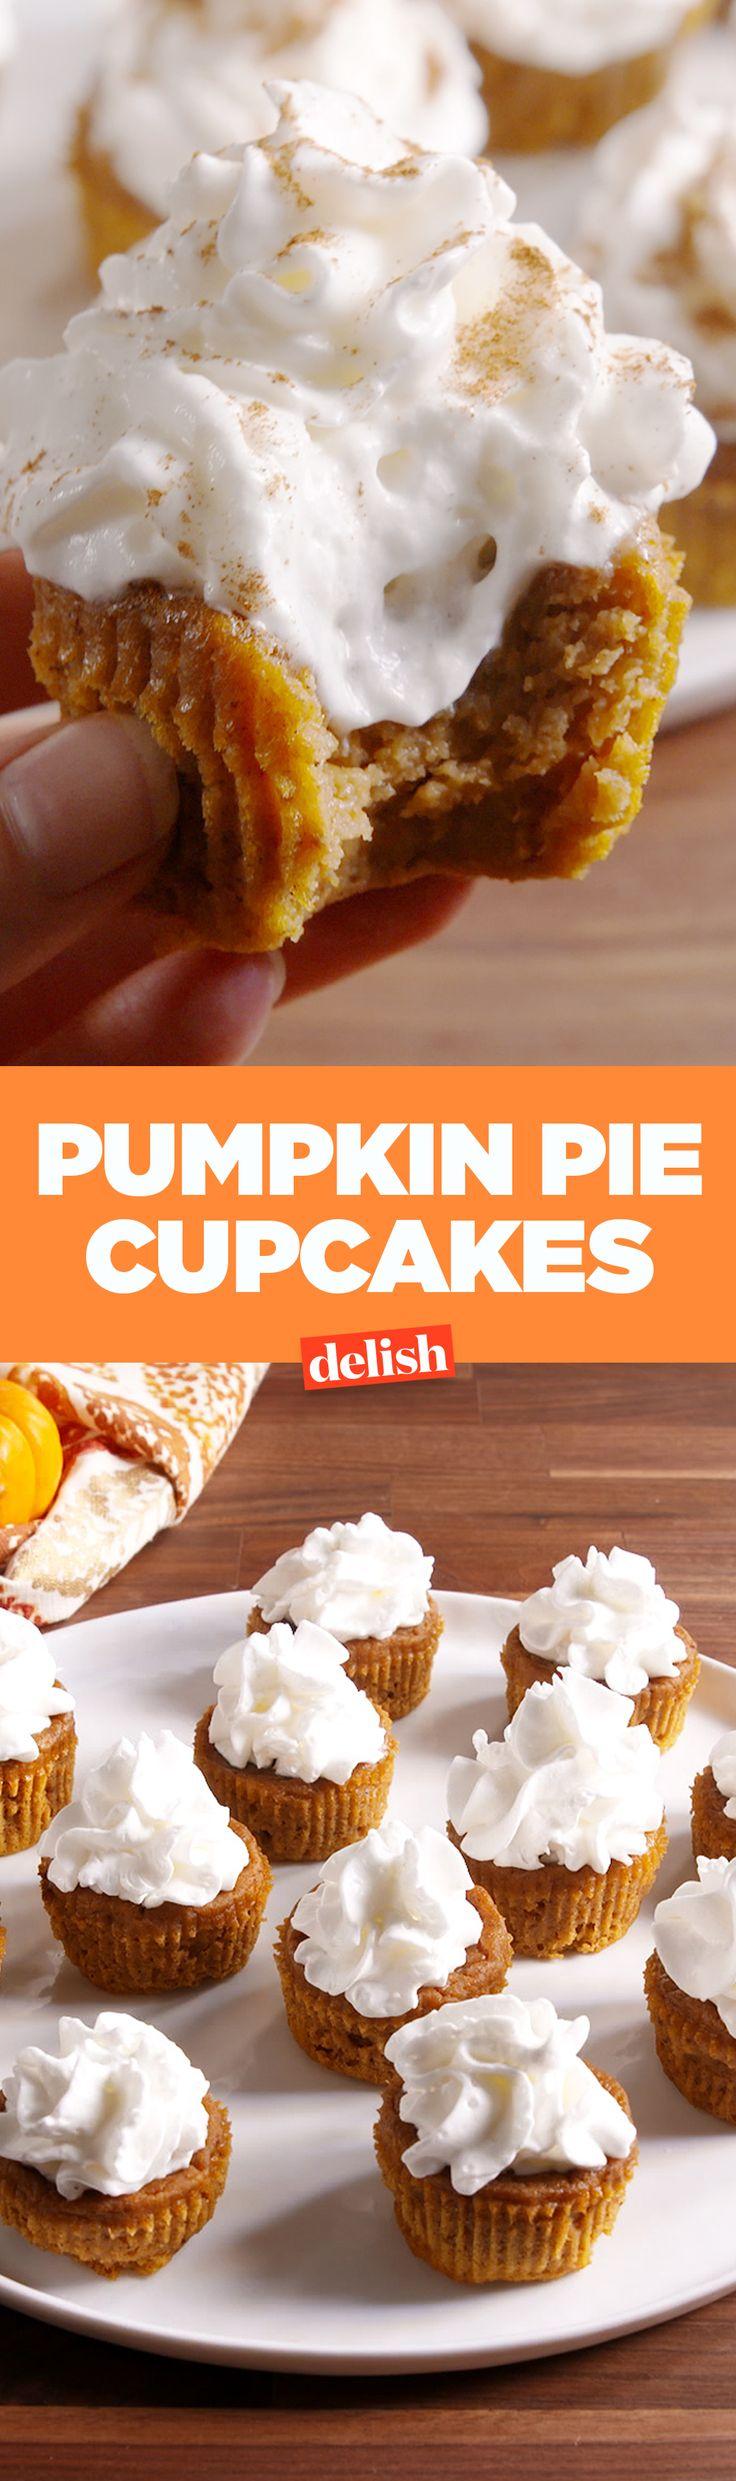 Thanksgiving cupcake decorations - Pumpkin Pie Cupcakes